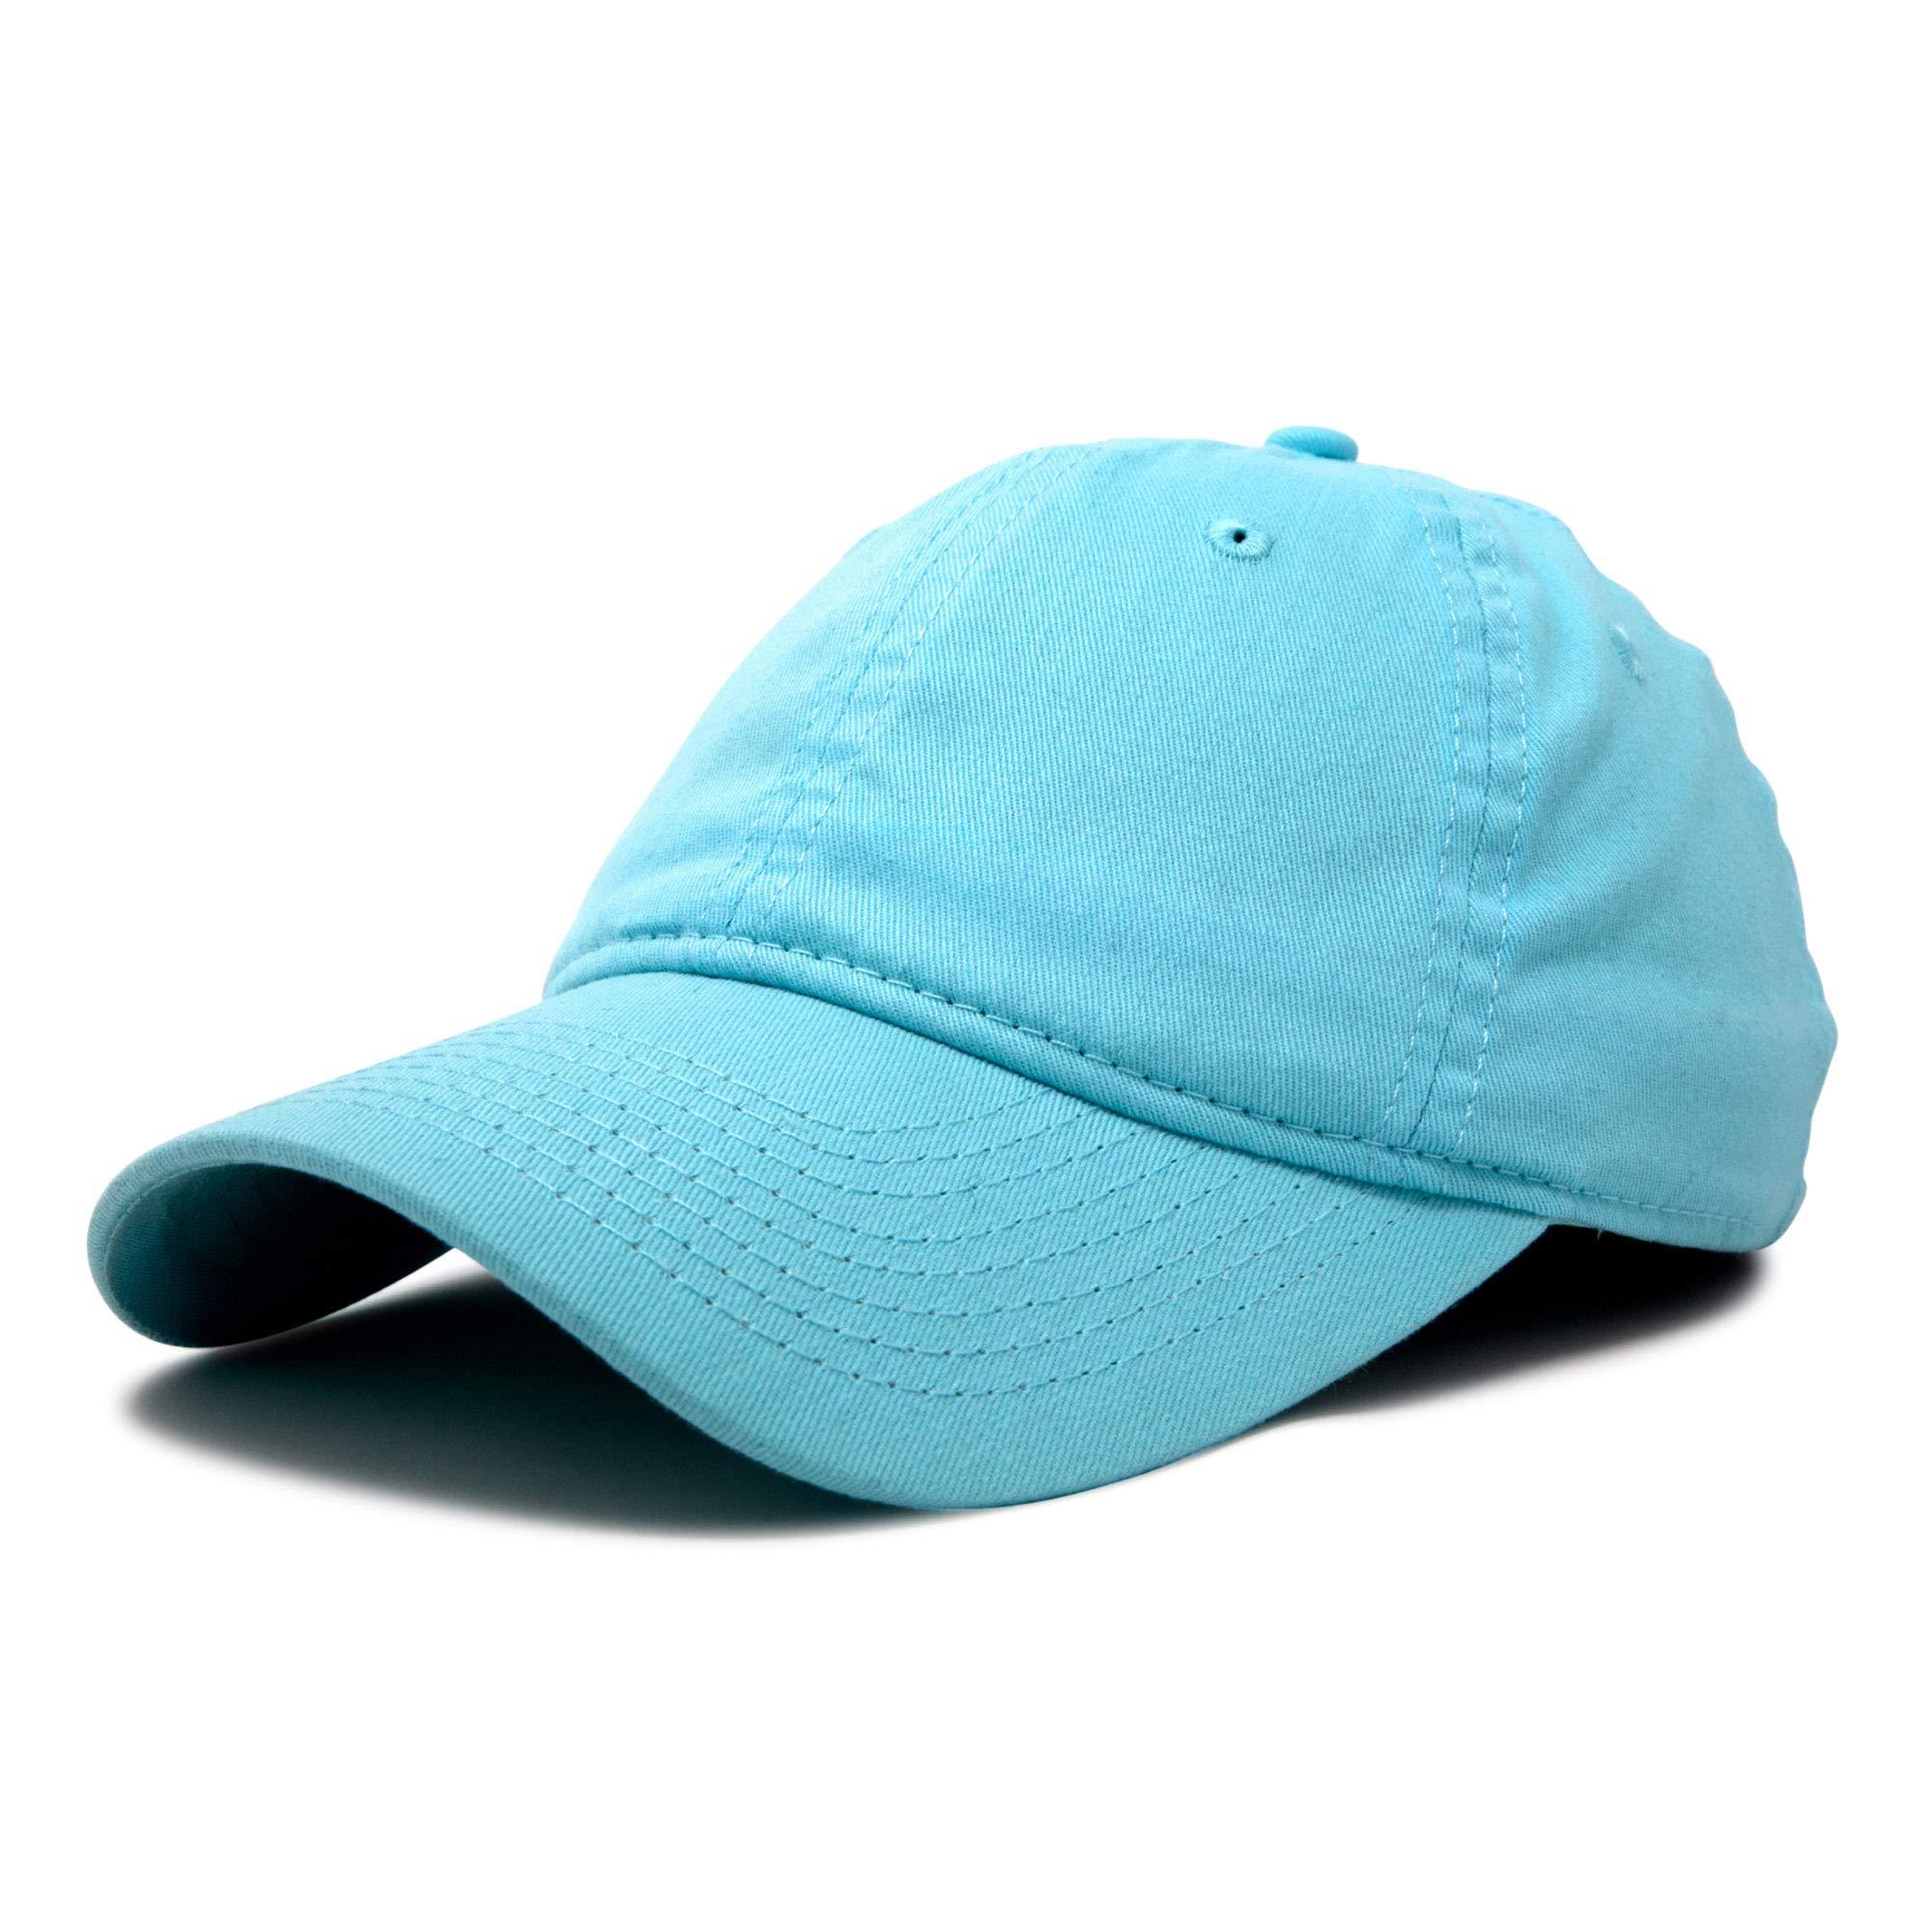 bec976423eaa1 DALIX Womens Cap Adjustable Hat 100% Cotton Black White Gold Lavender Blue  Pink Lime Green